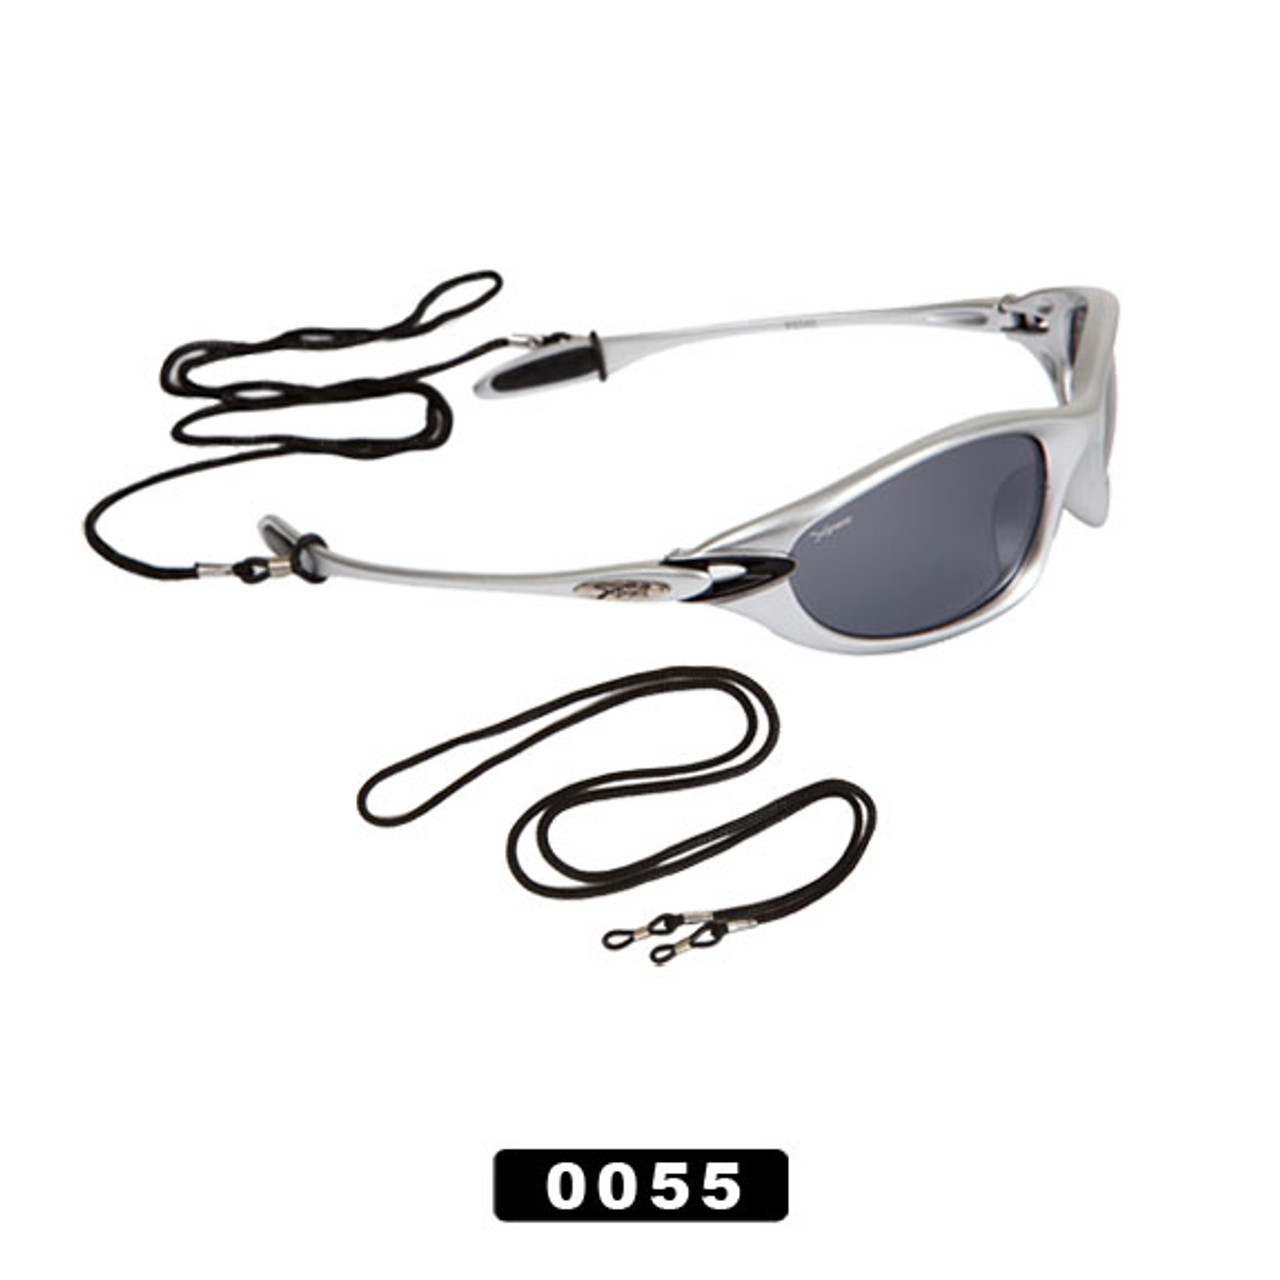 Sunglass Cord